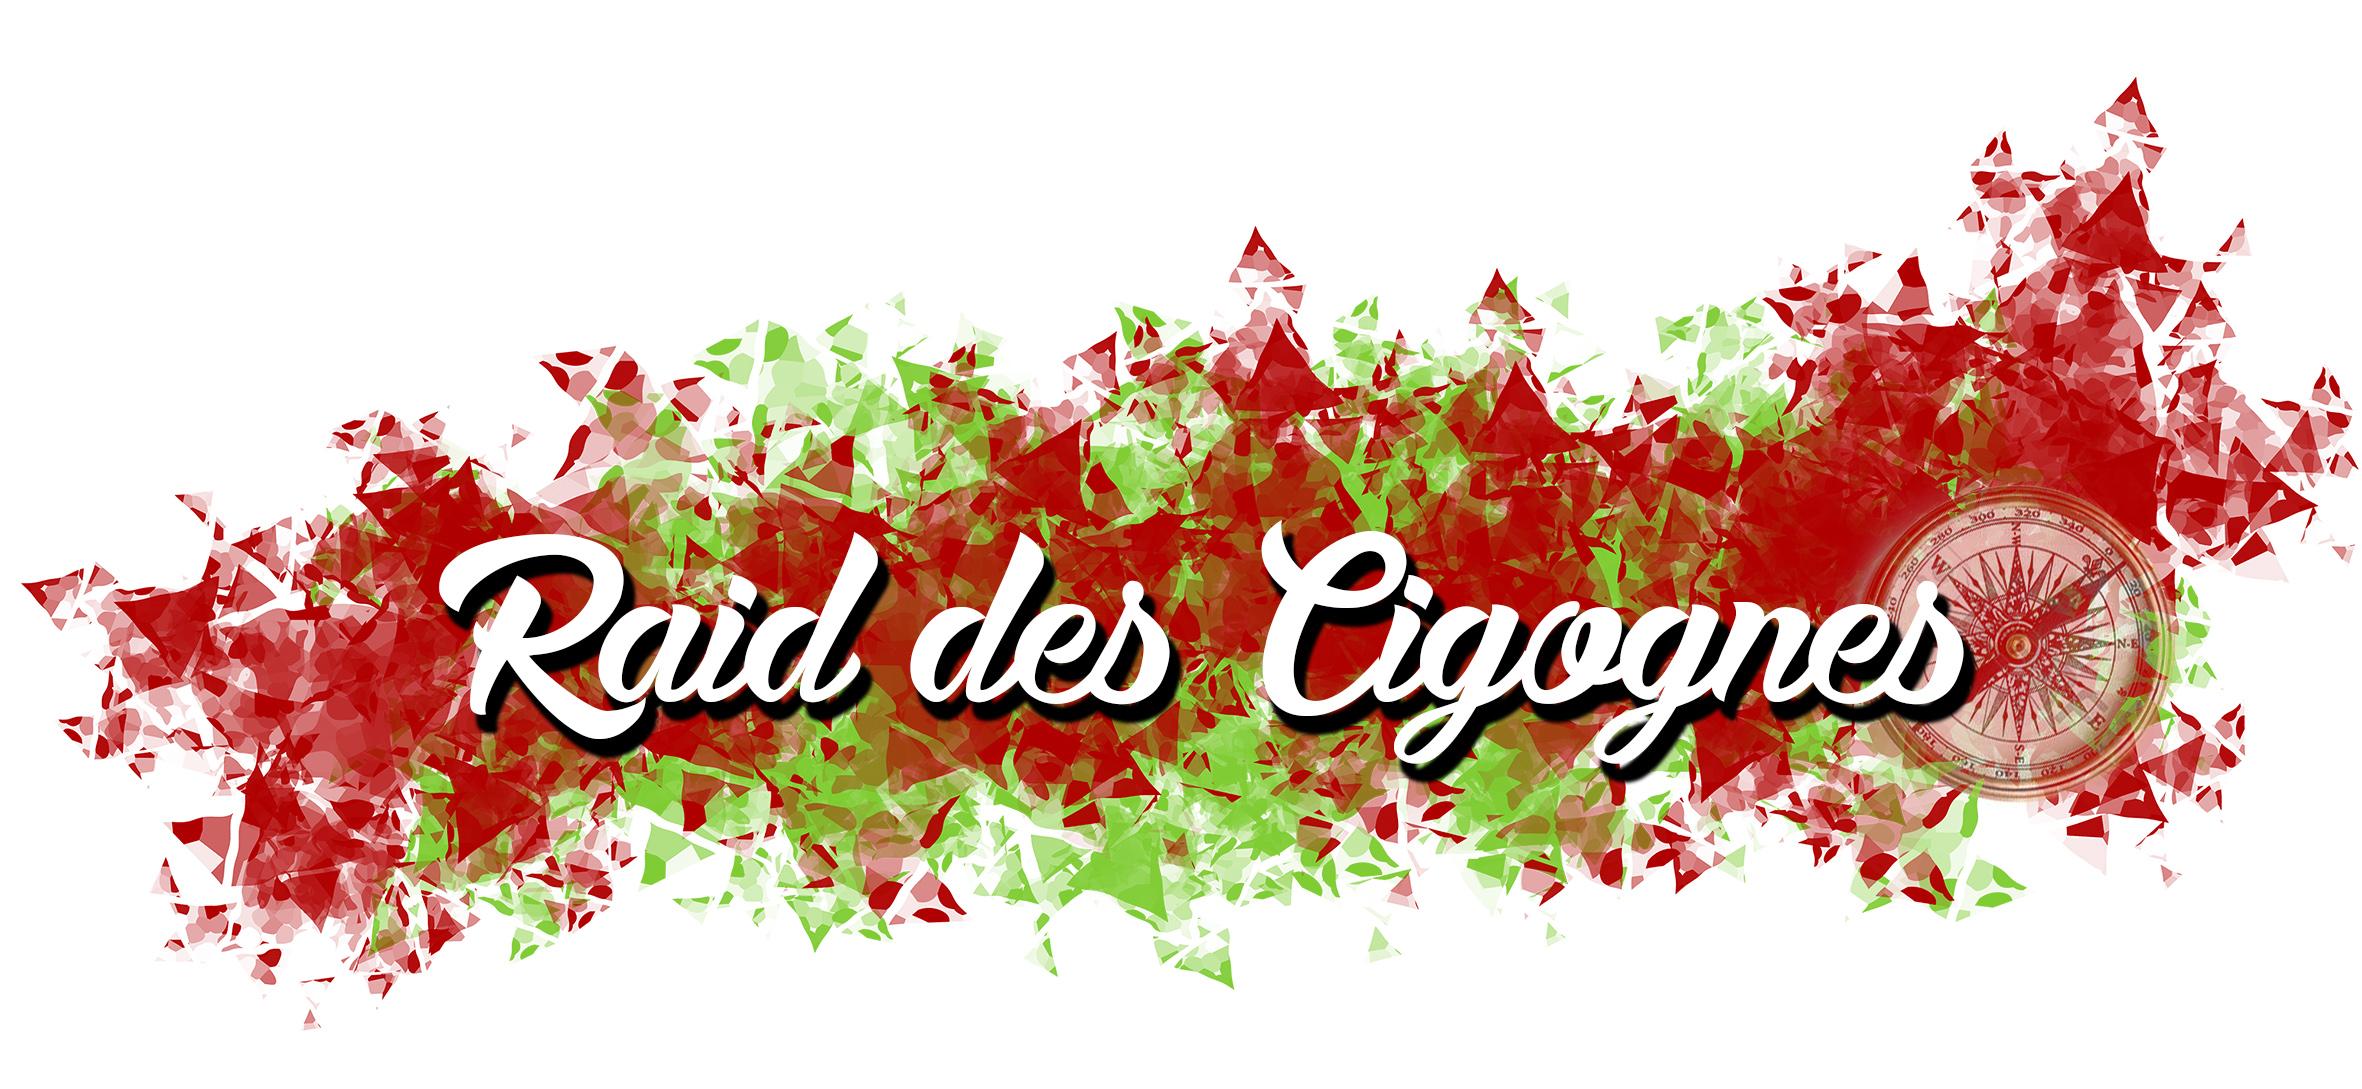 RAID DES CIGOGNES LOGO